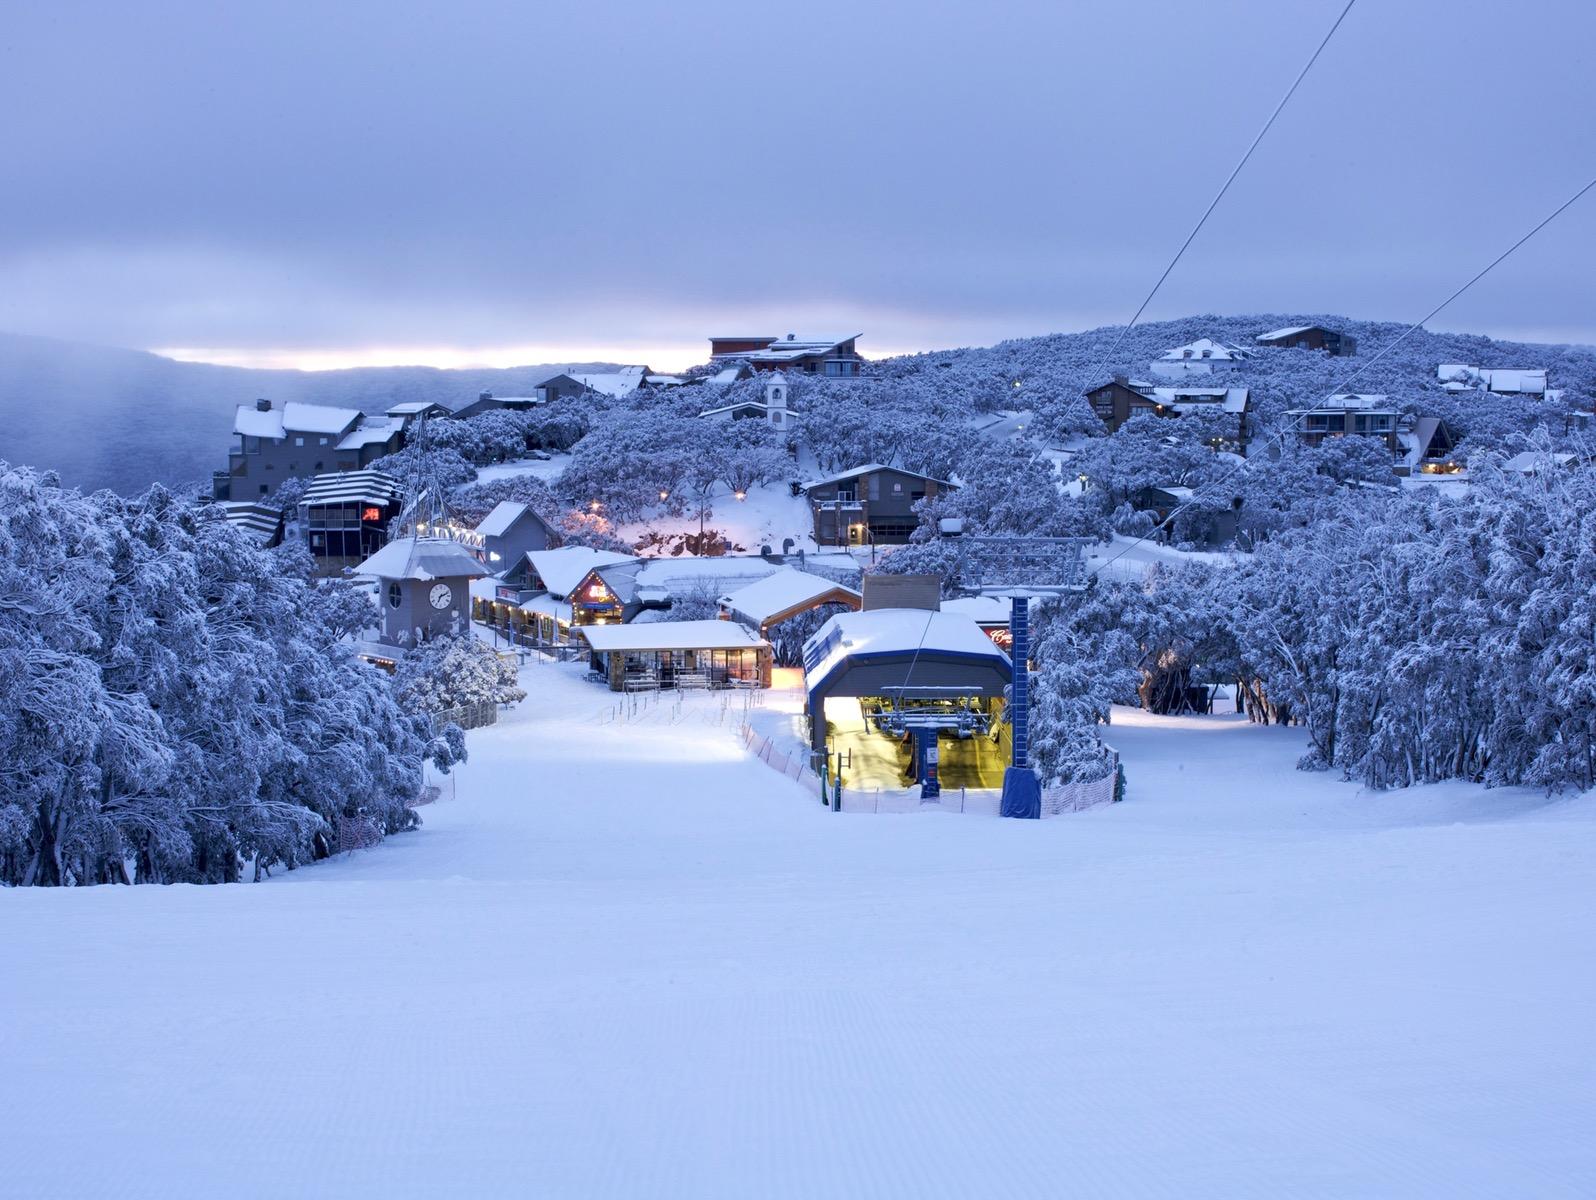 Mt Buller, Luxury Snow Tour, Melbourne Australia